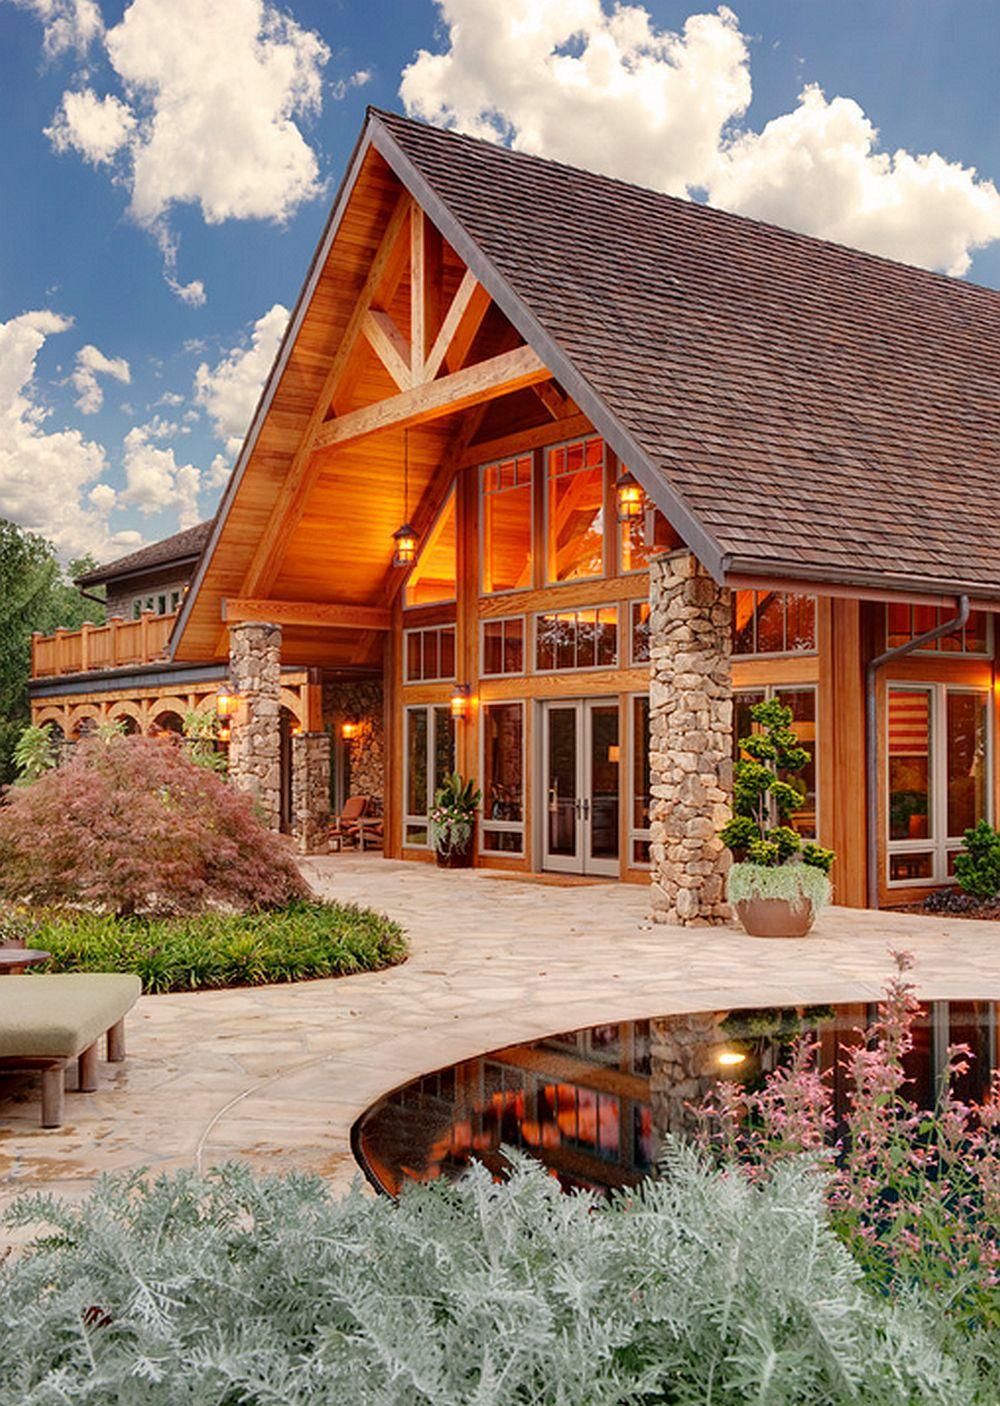 adelaparvu.com casa din lemn, casa american Georgia, arhitecti Moon Bros Architecture, Foto Galina Coada (2)